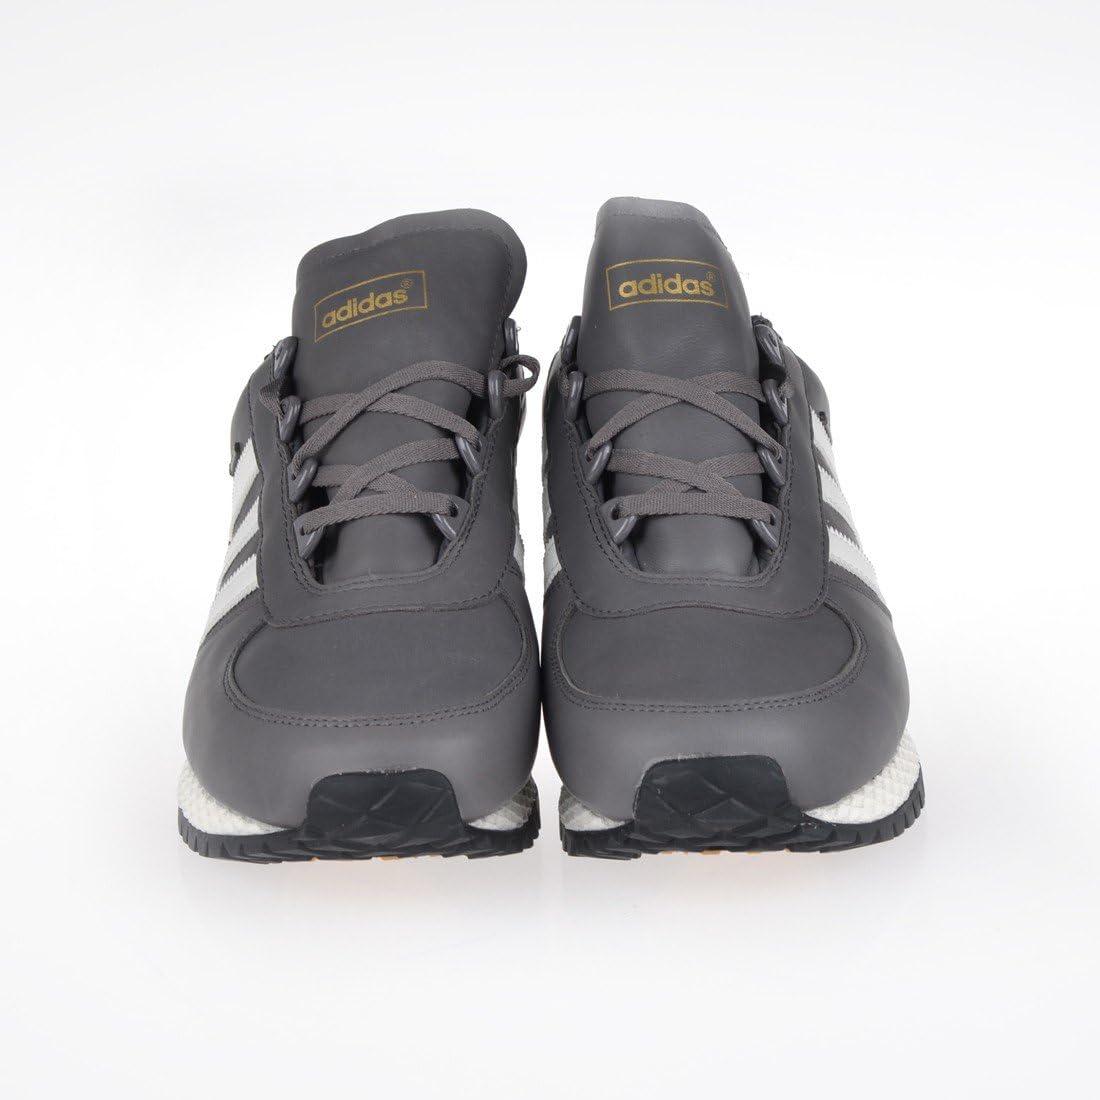 adidas spezial waterproof